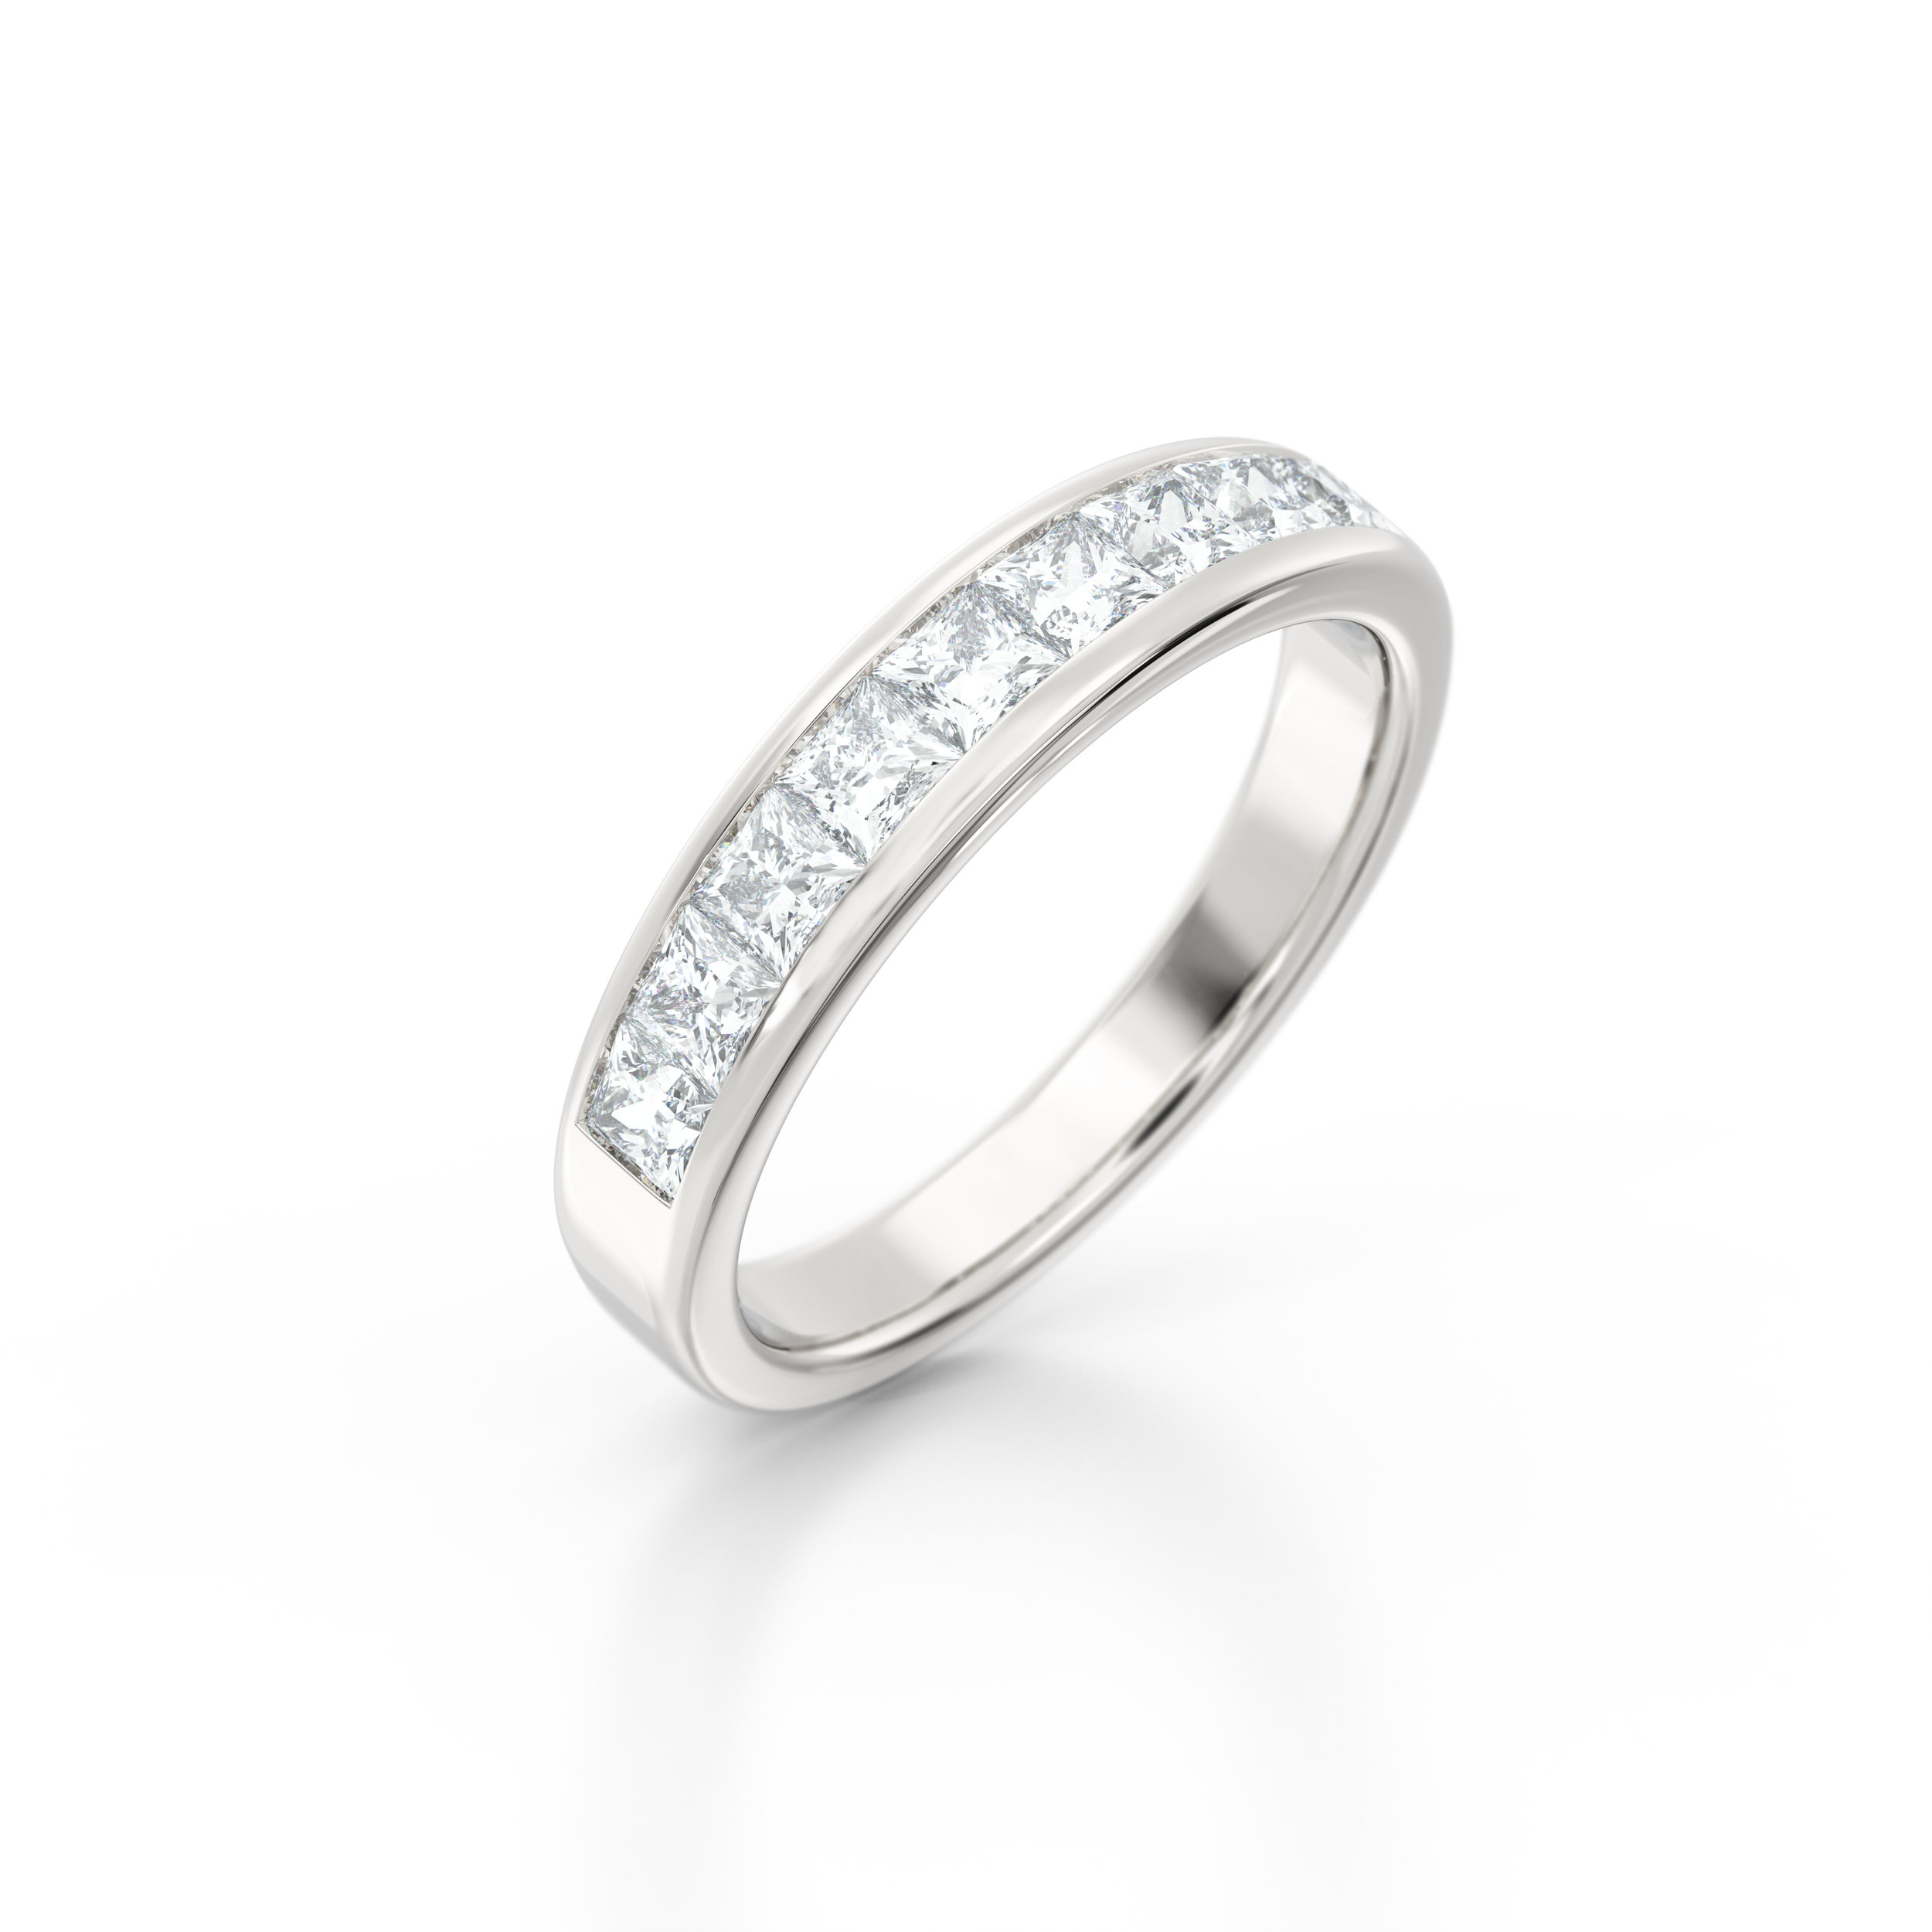 Channel set princess cut eternity ring